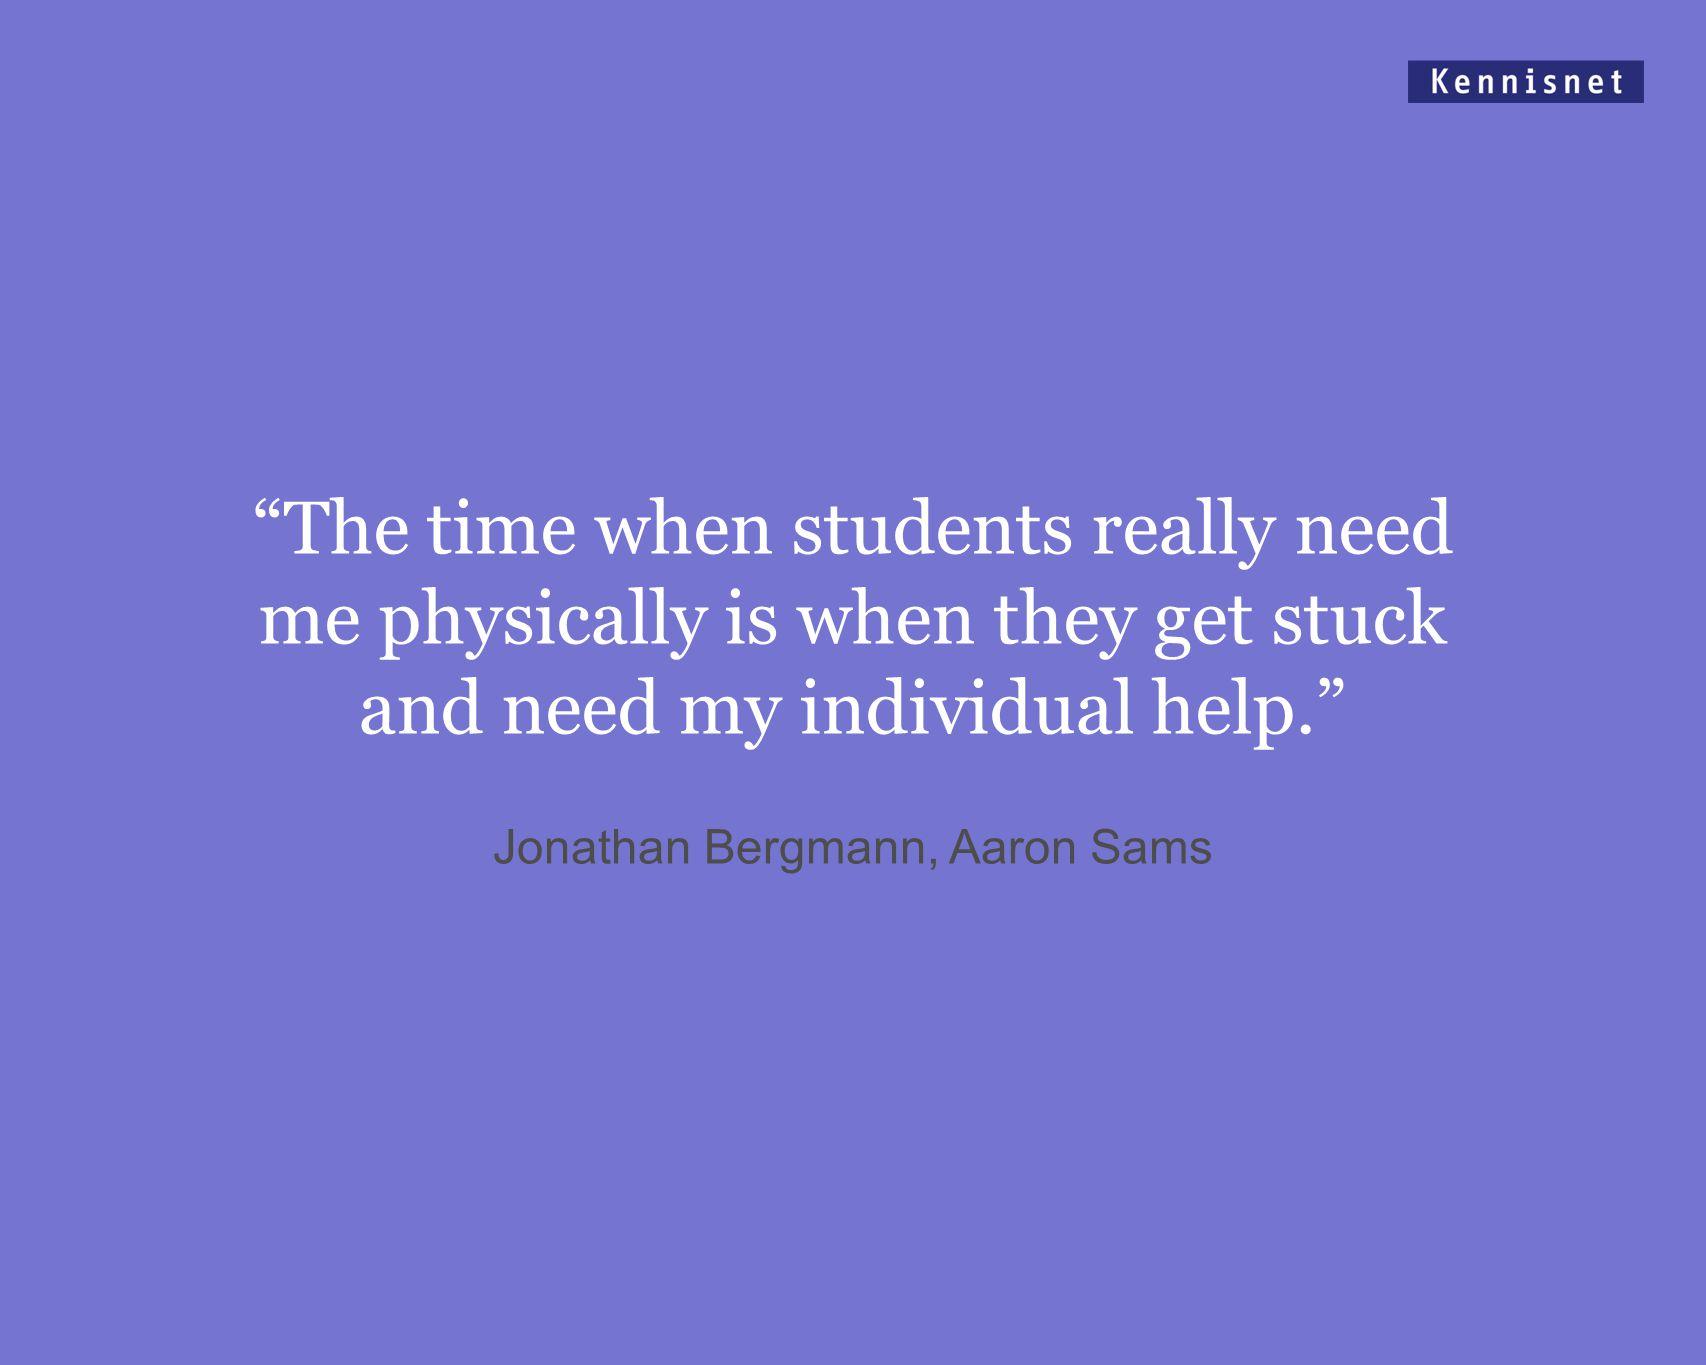 Jonathan Bergmann, Aaron Sams